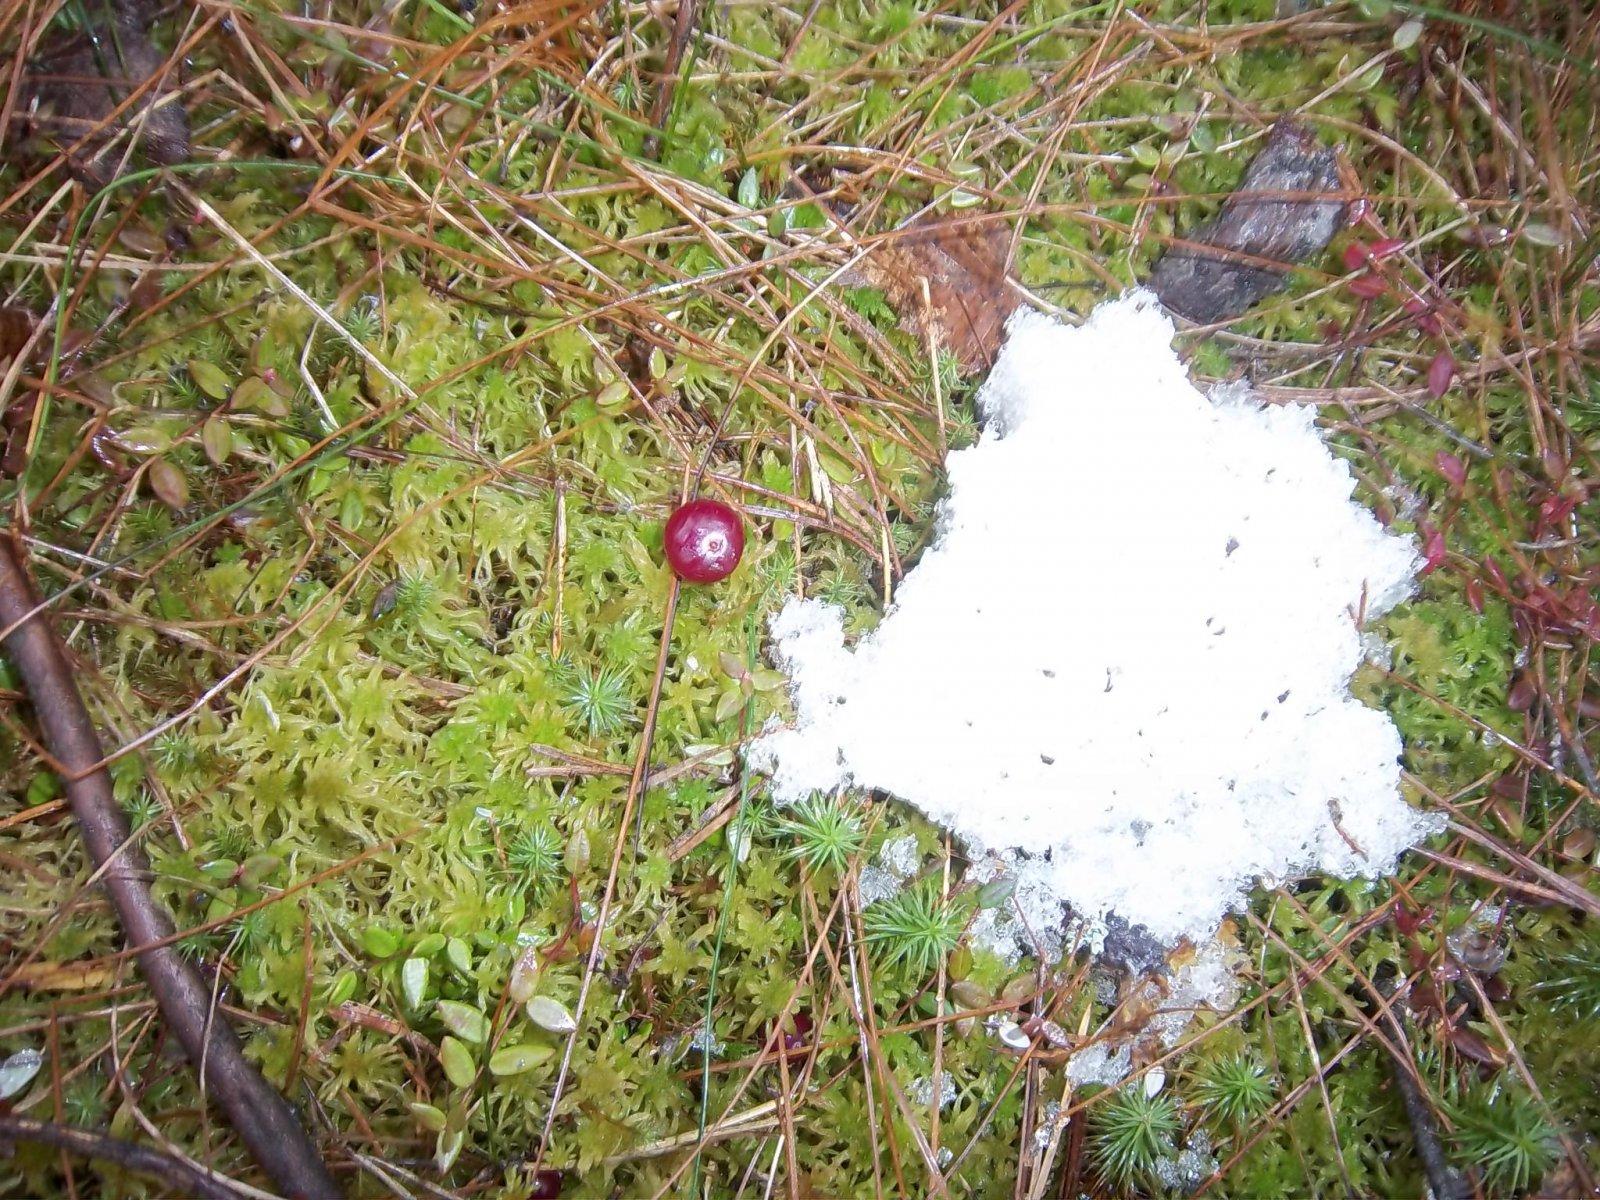 Клюква весной на болоте